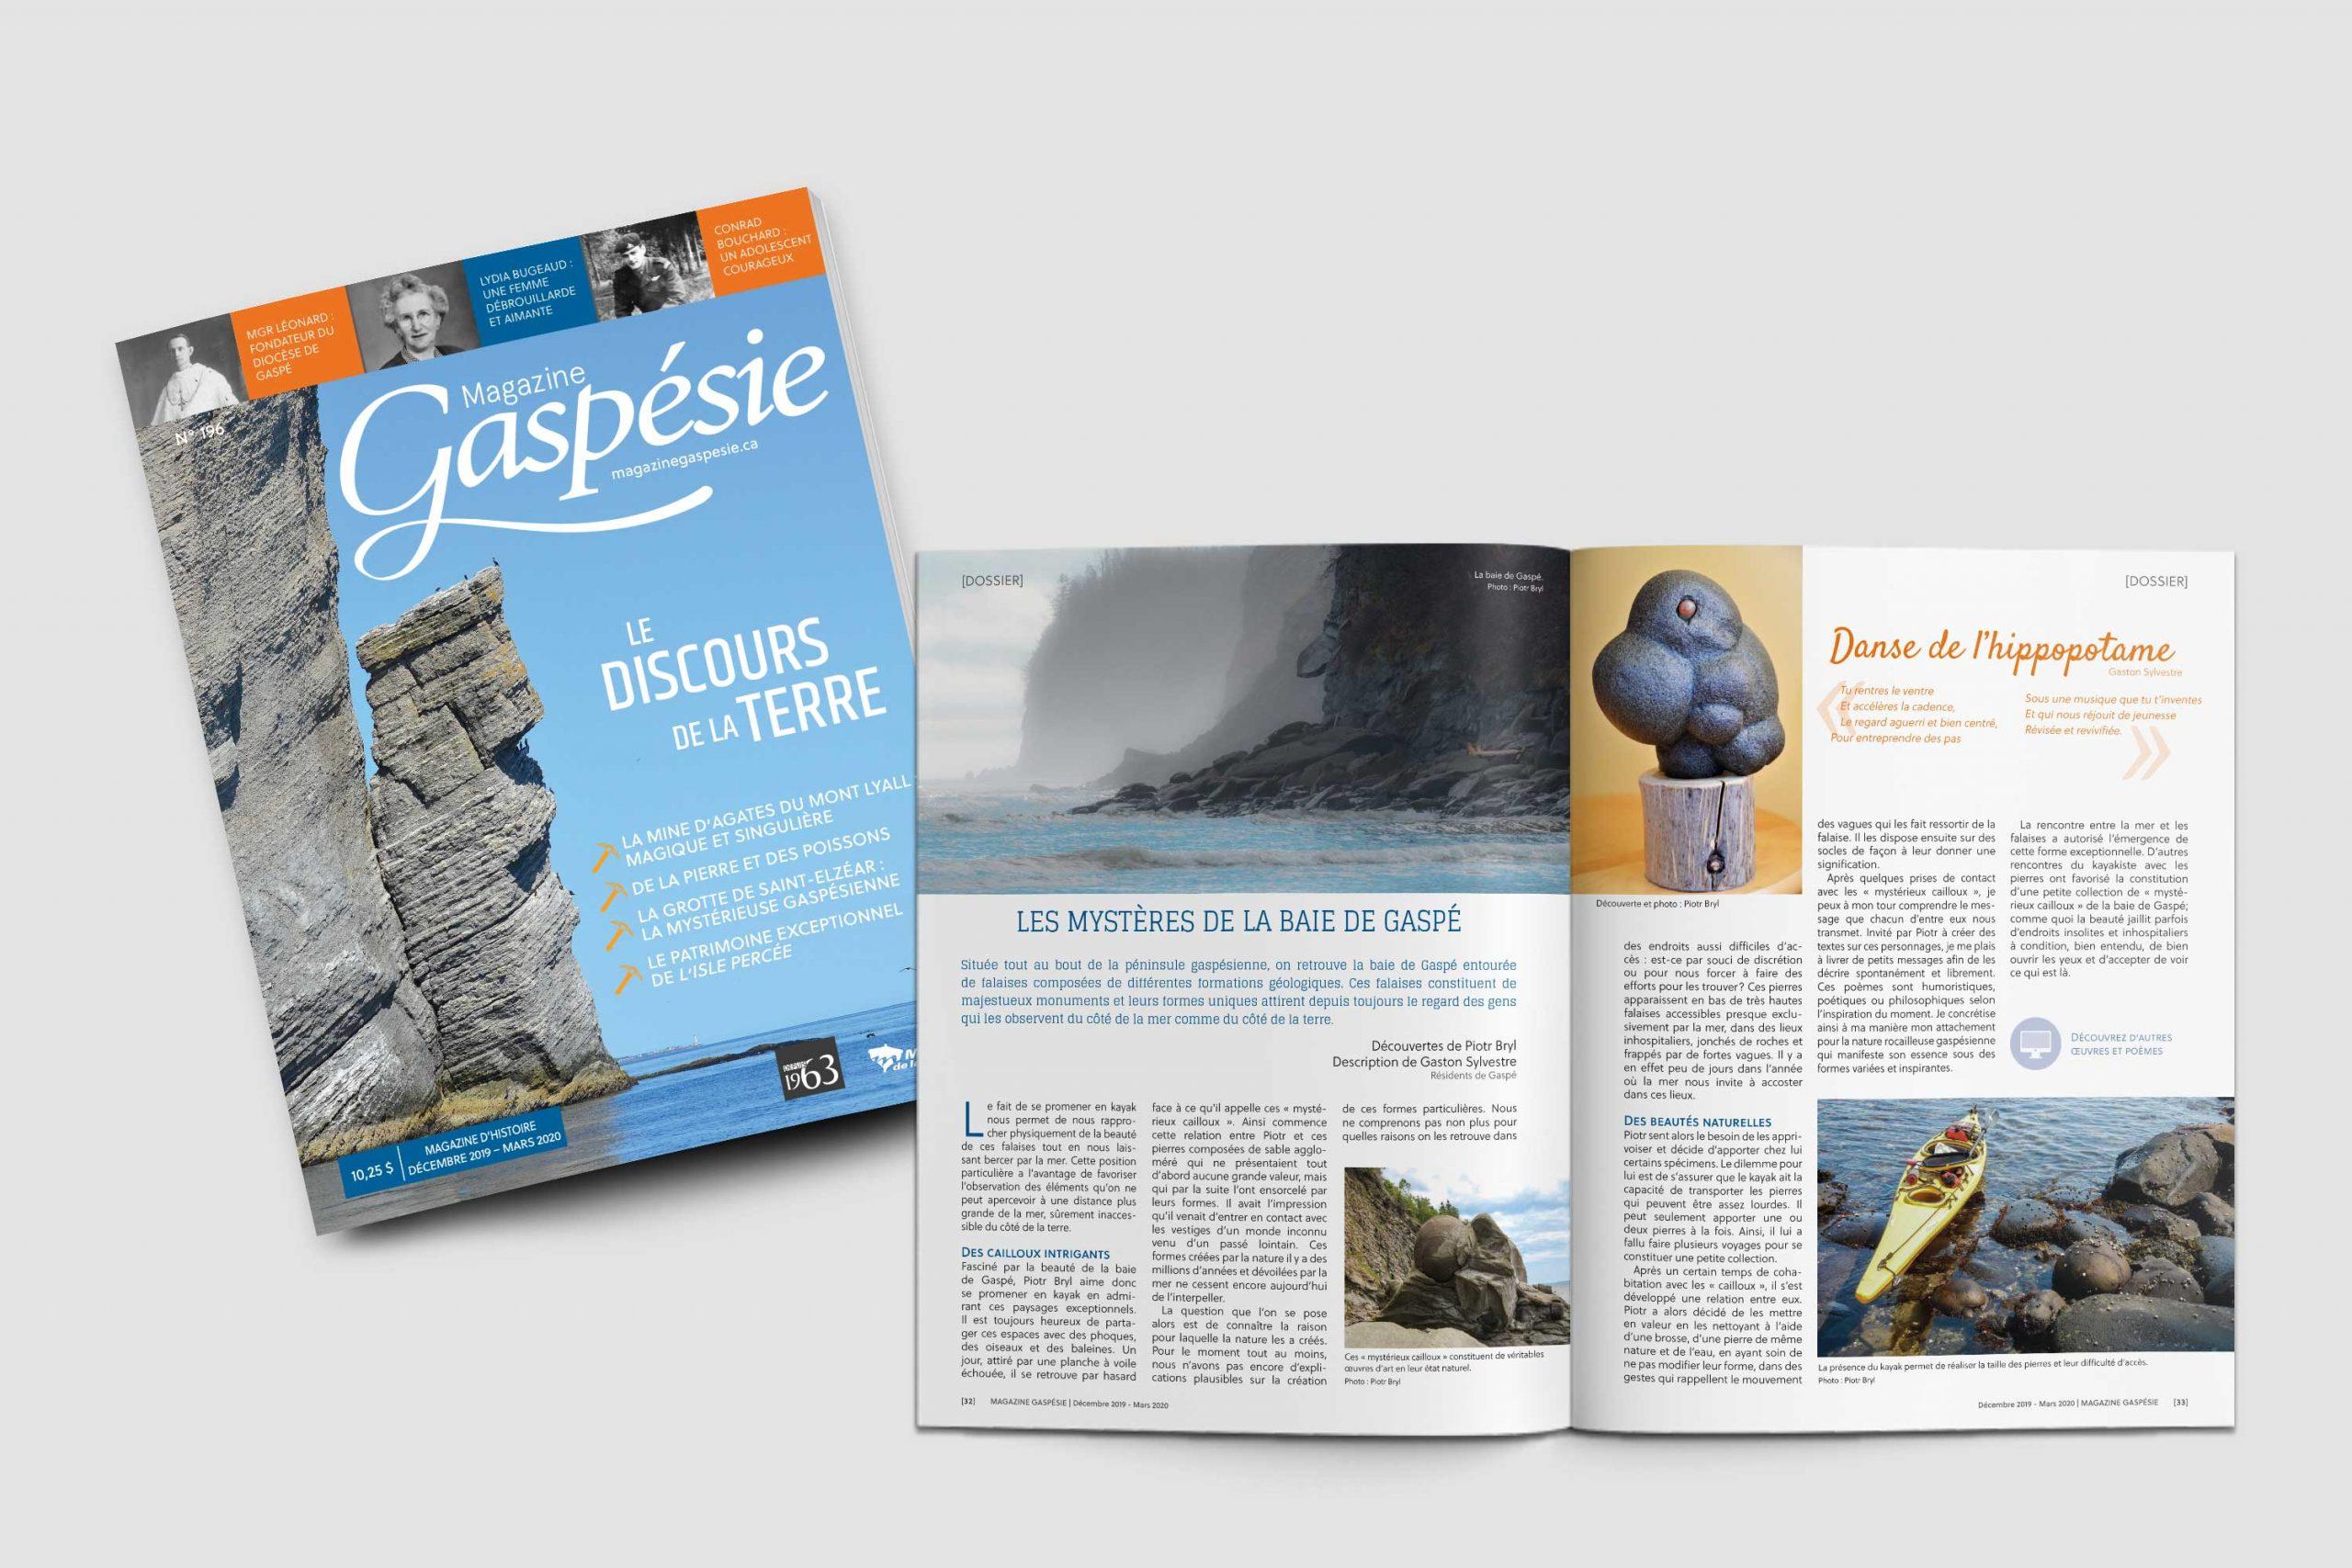 Mailys_ORY-Graphiste_Edition_Magazine-Gaspesie3